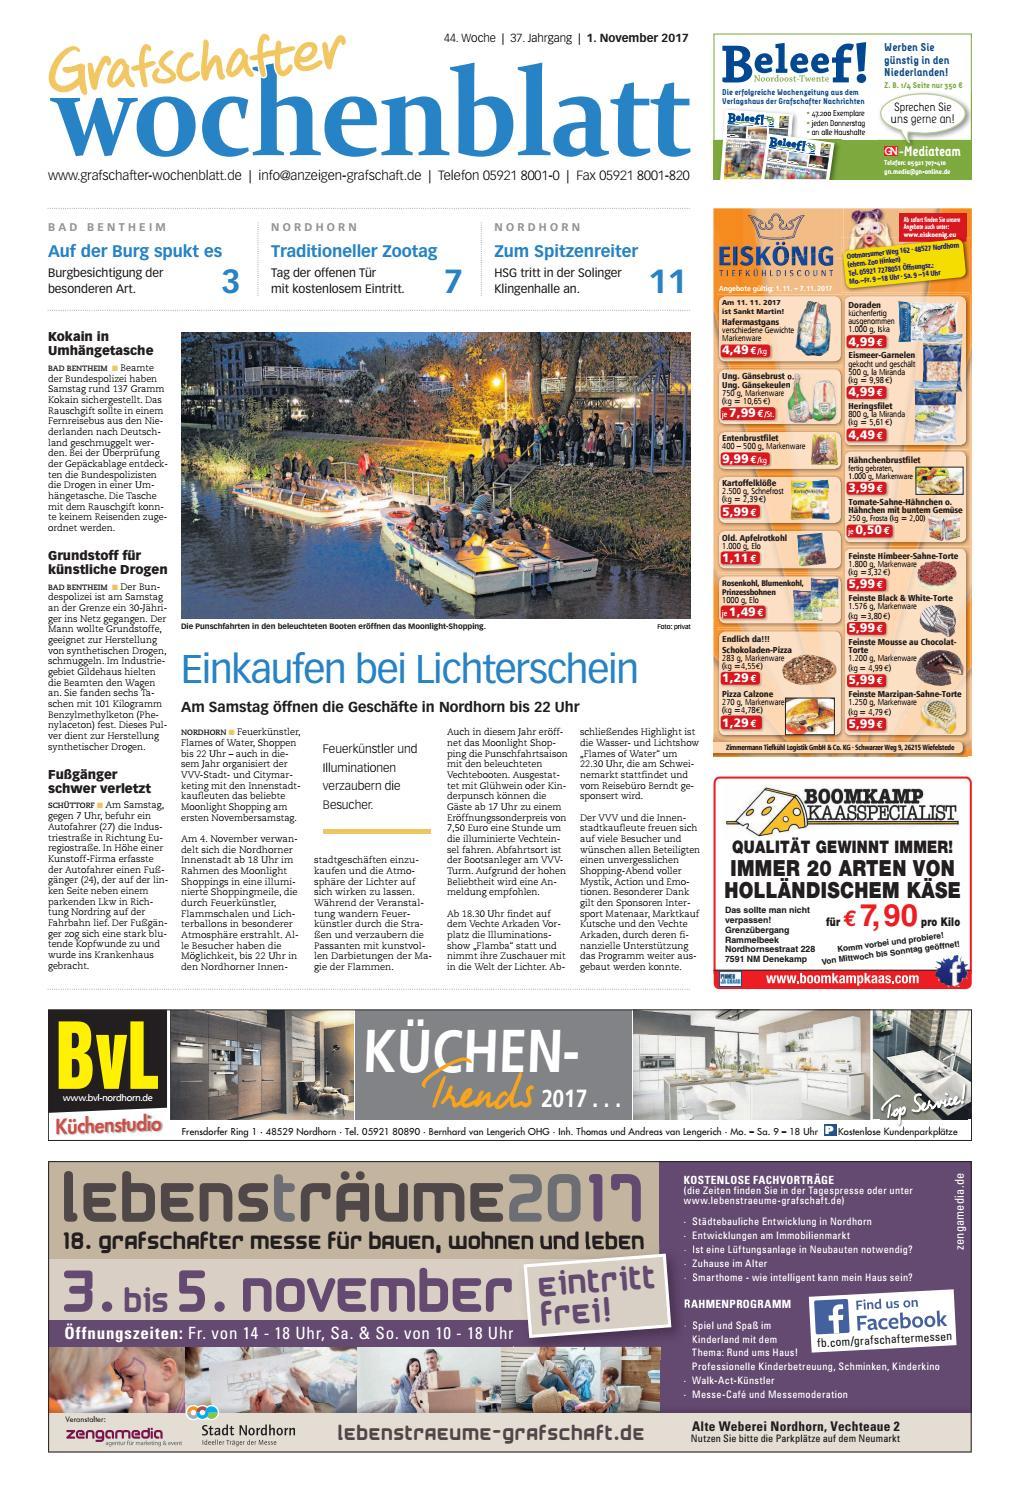 Grafschafter Wochenblatt_1-11-2017 by SonntagsZeitung - issuu